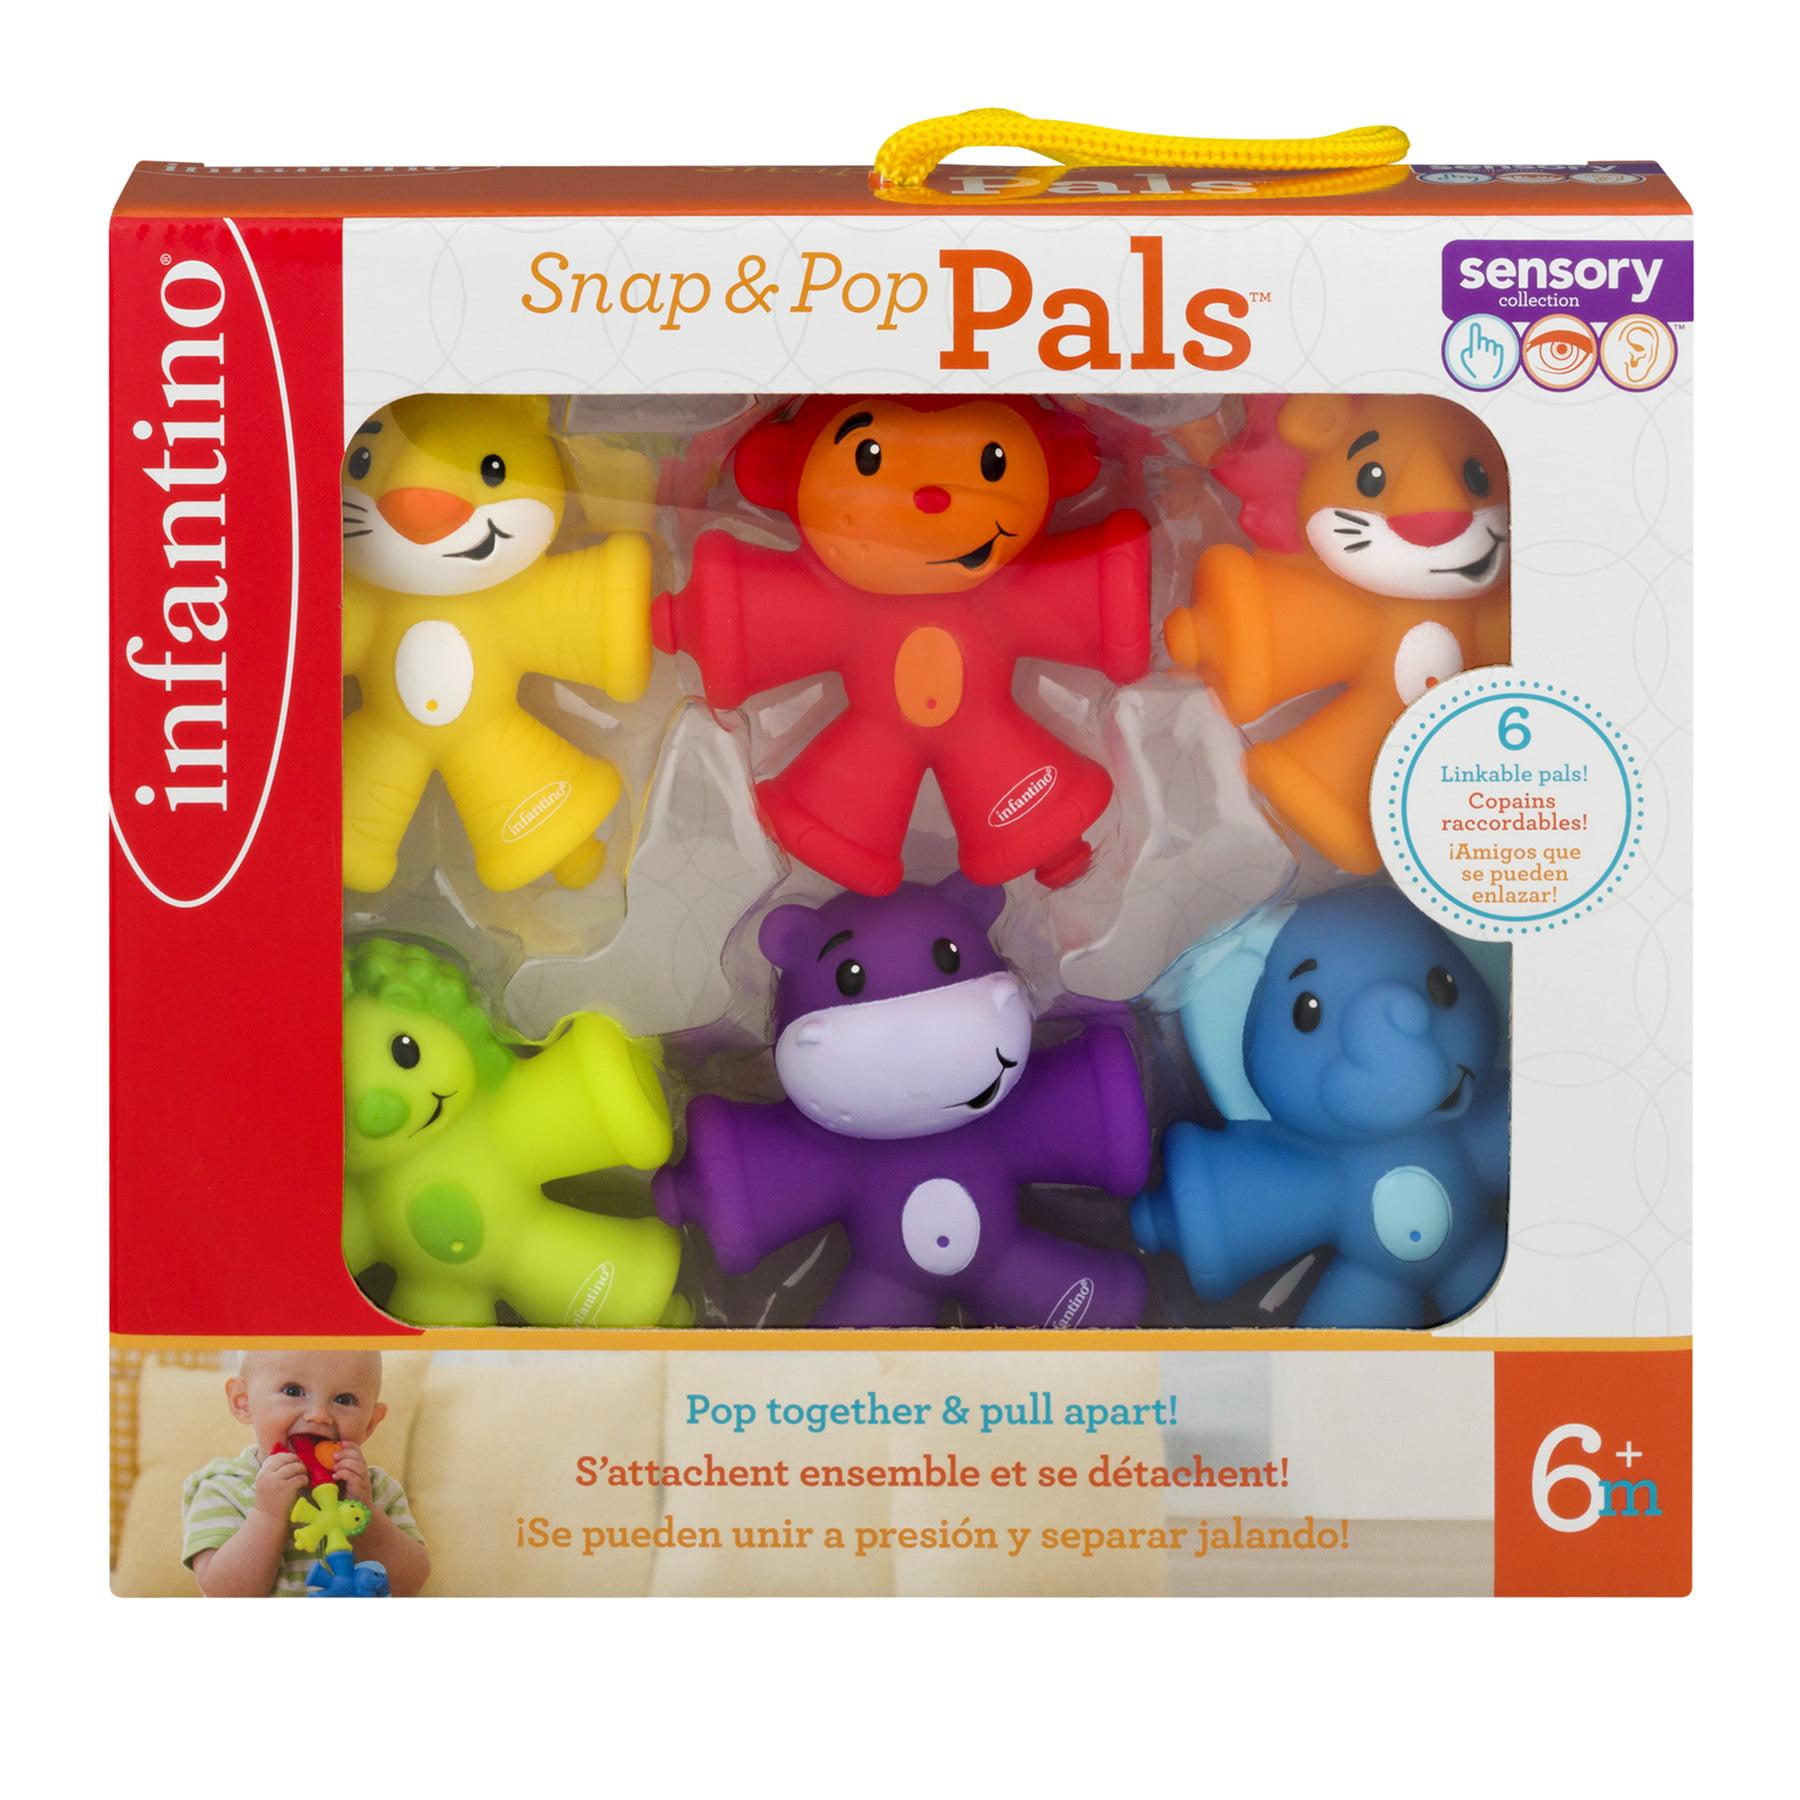 Infantino Snap & Pop Pals 6+m - 6 CT6.0 CT